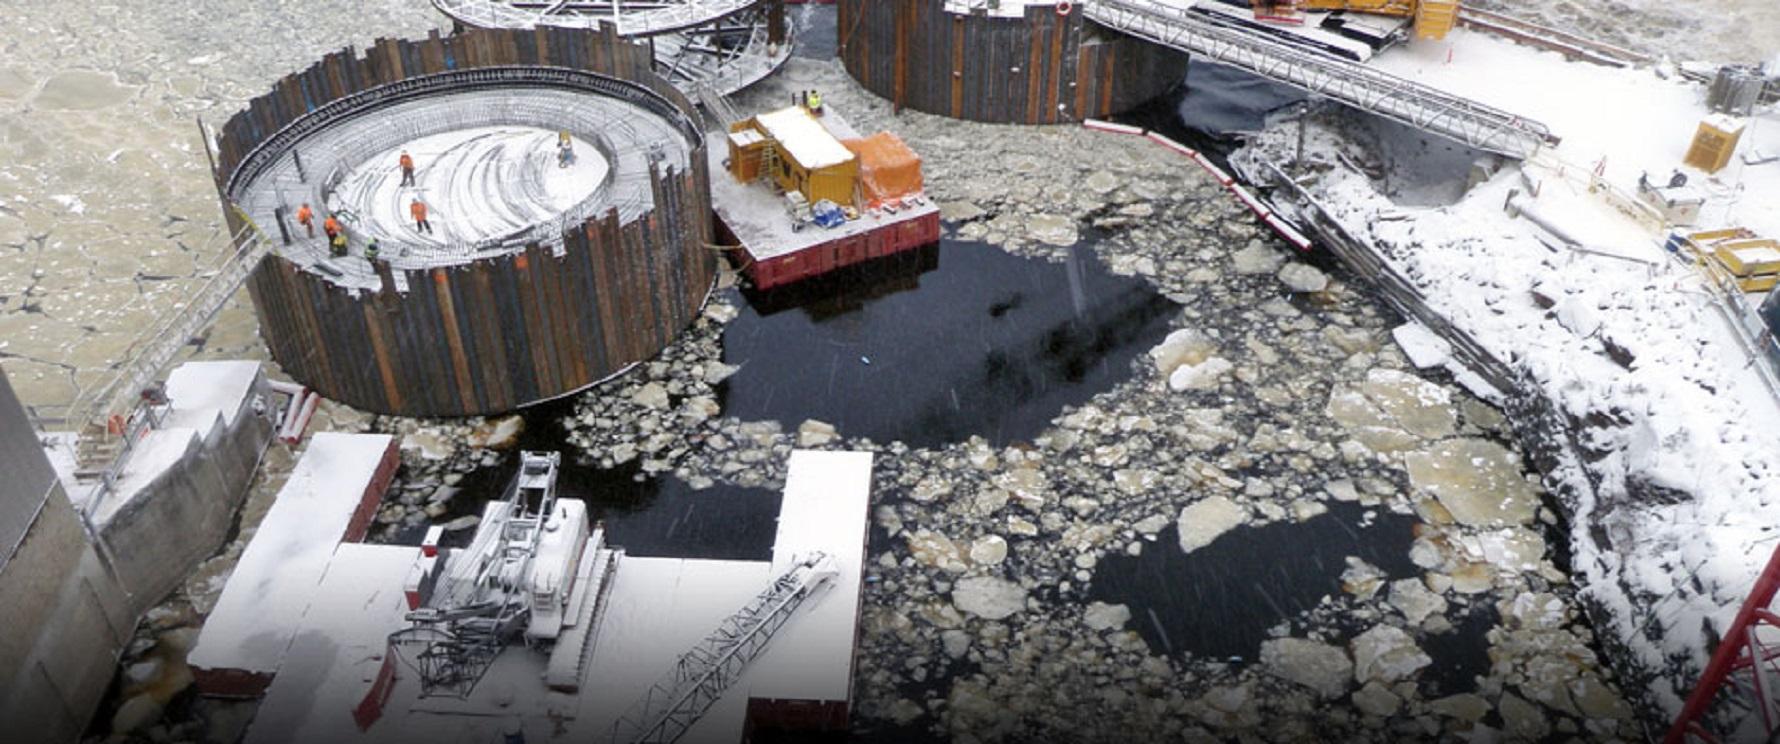 OctoAir10 industrial deicing